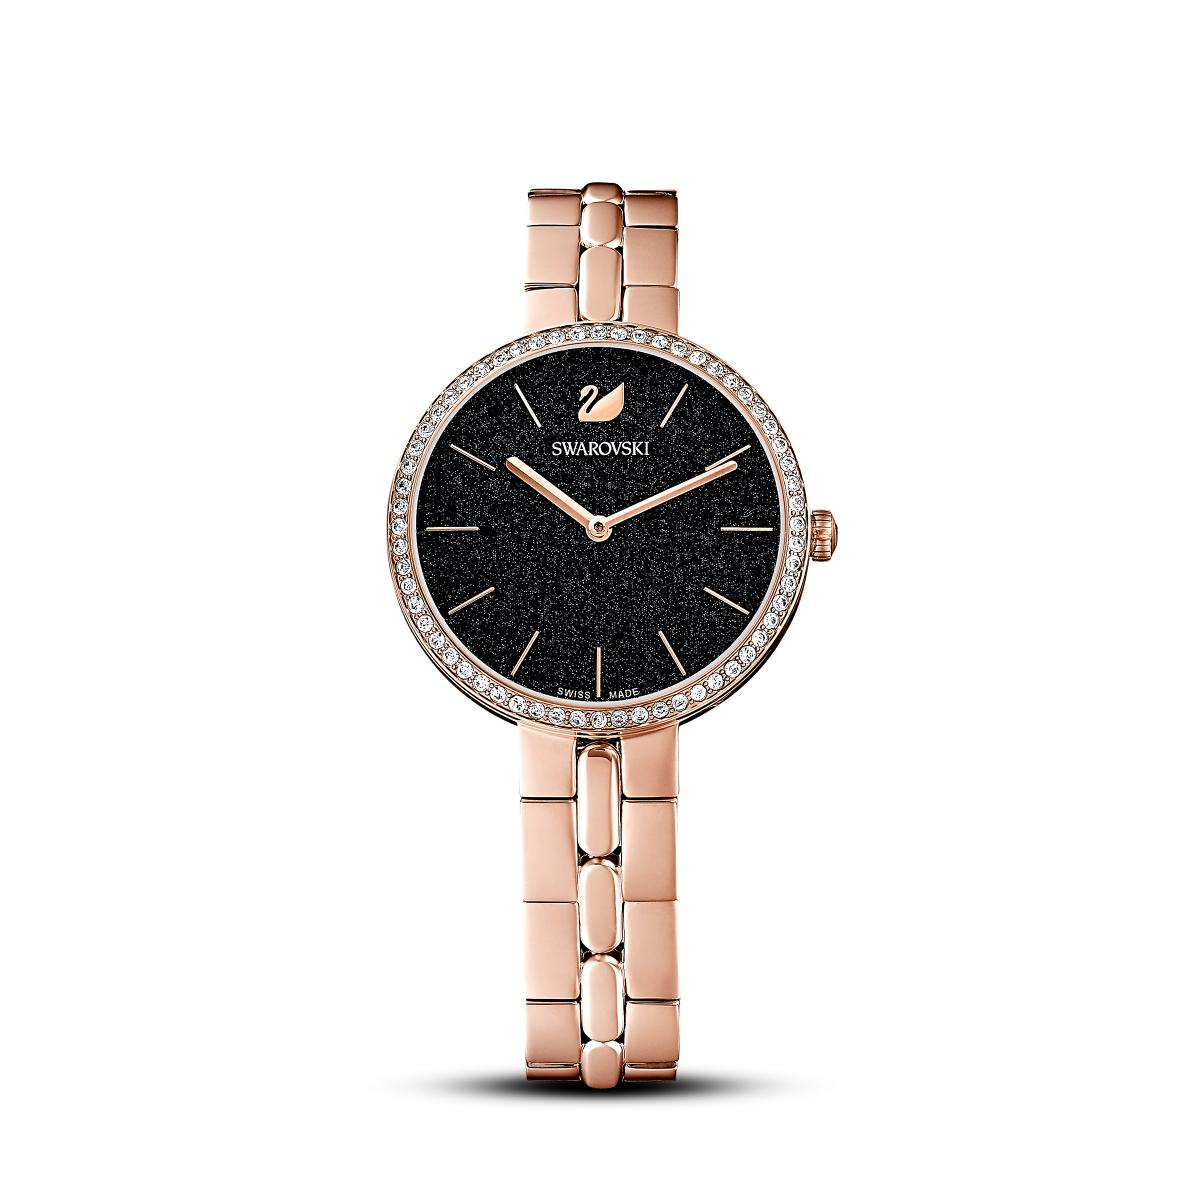 MONTRES 5517797 - COSMOPOLITAN - Swarovski montres - Modalova